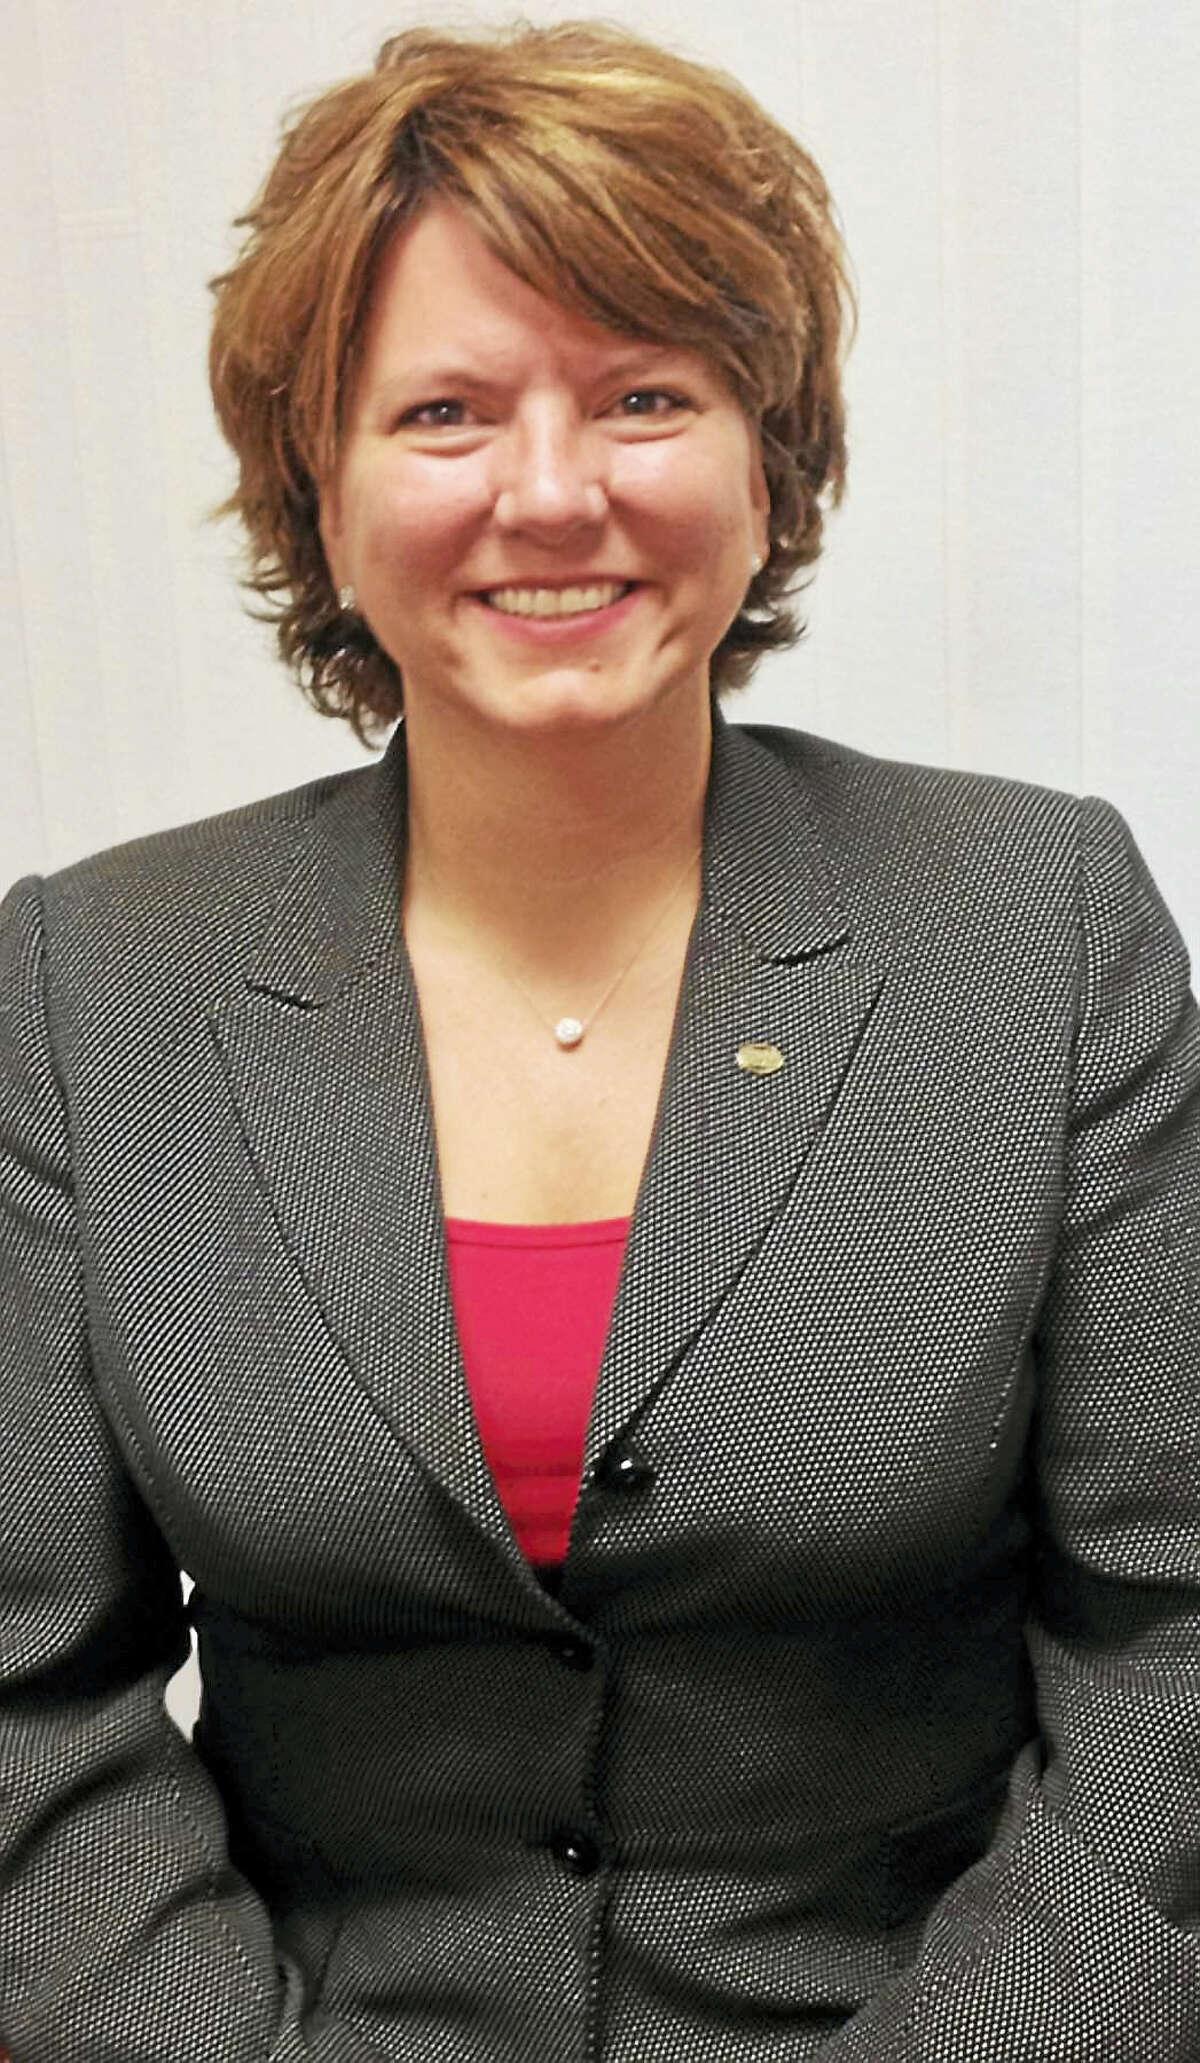 Lisa Partrick